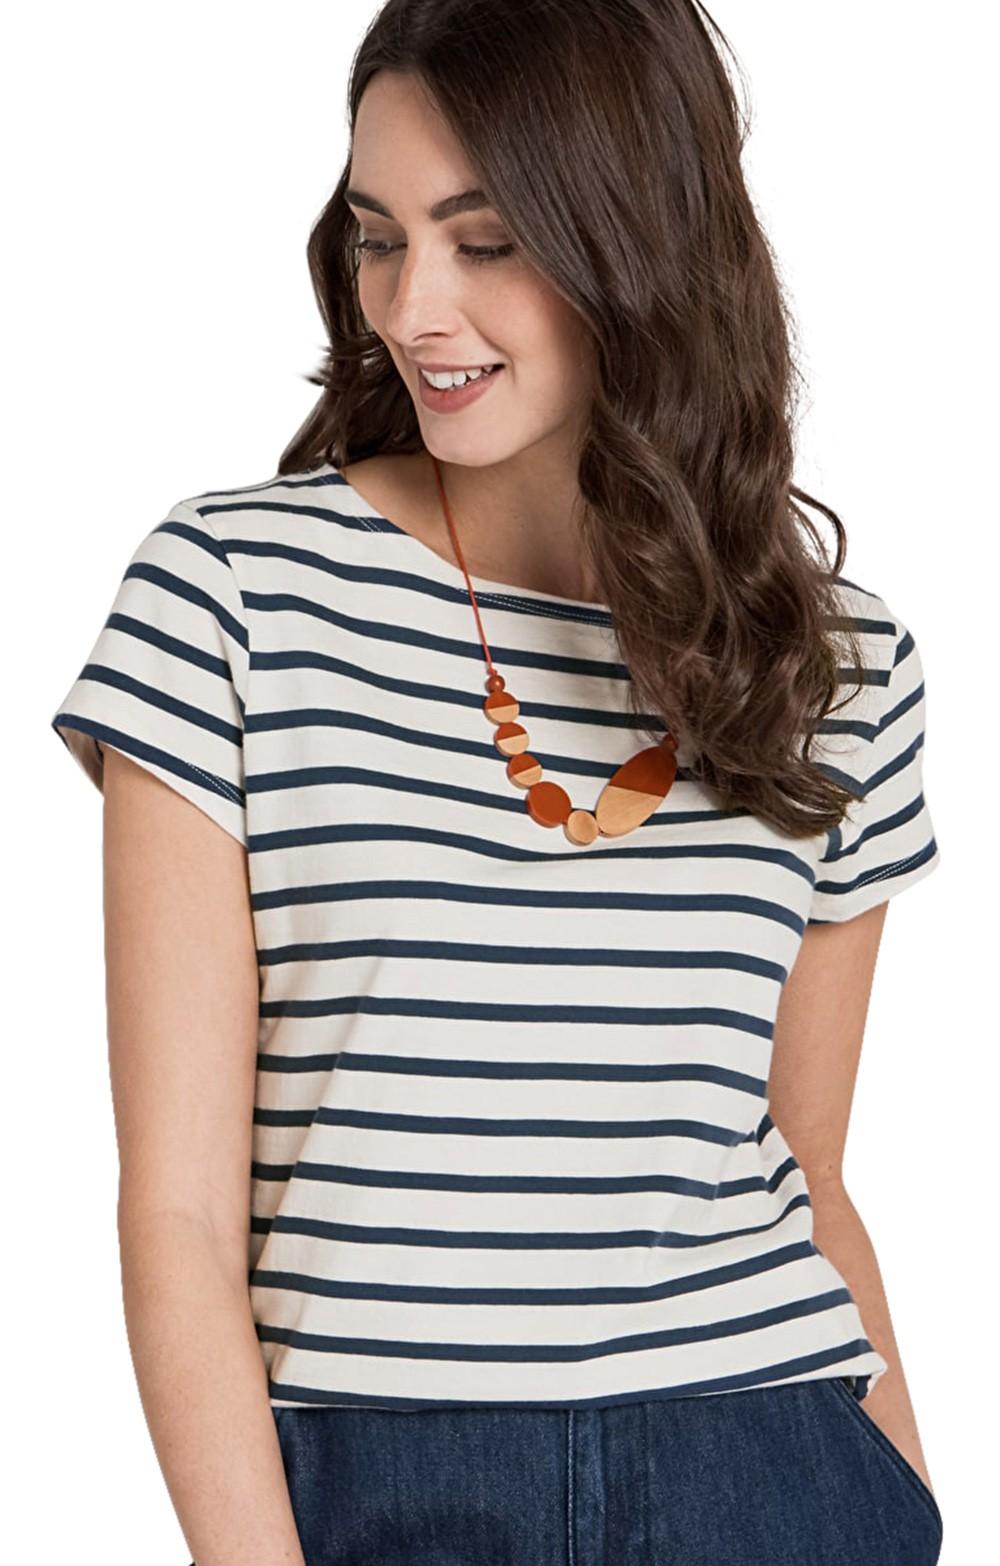 75c11679 Seasalt Sailor T-Shirt - House of Bruar